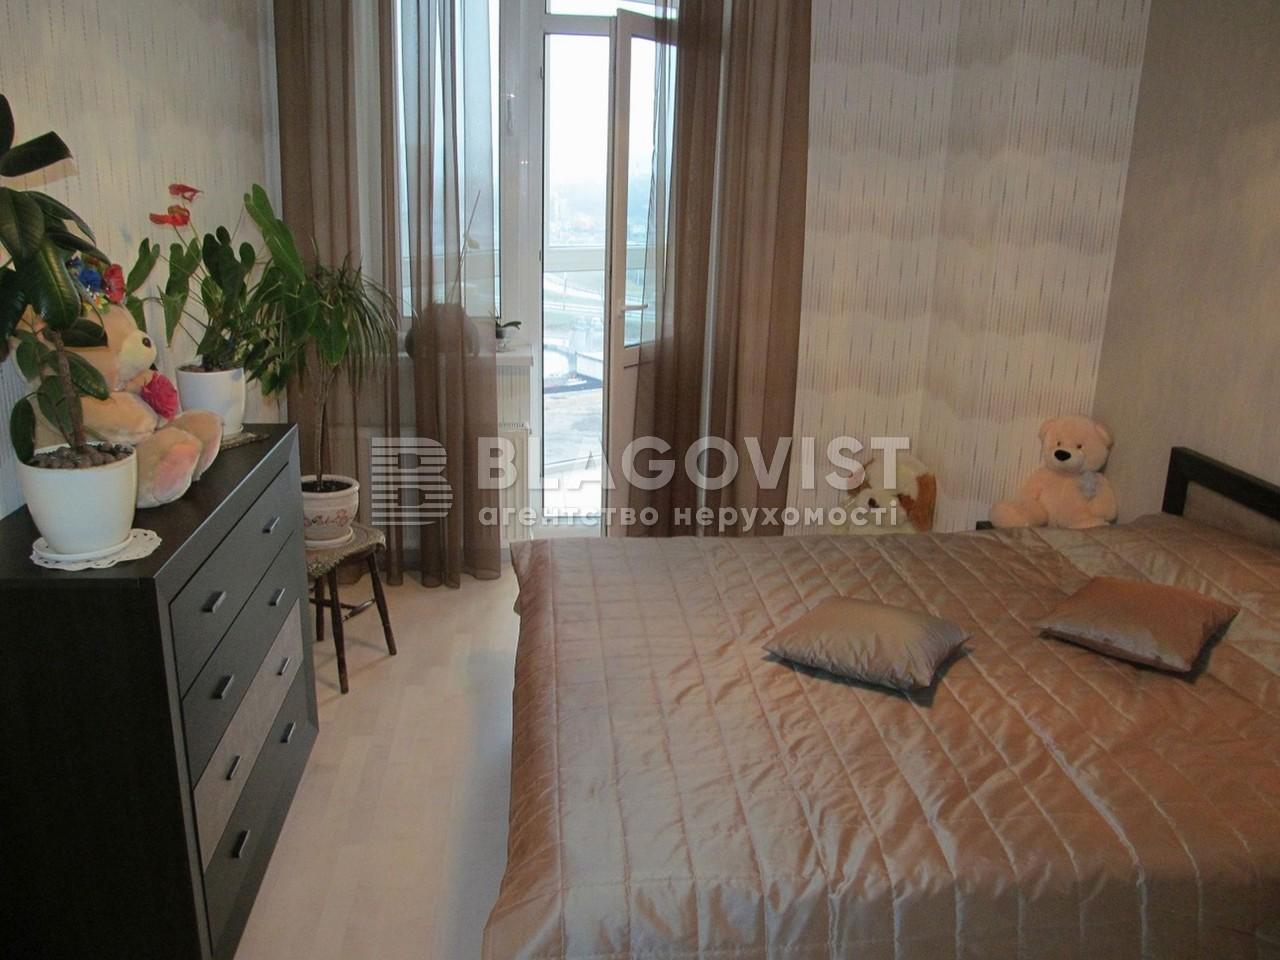 Квартира C-102428, Оболонская набережная, 1 корпус 1, Киев - Фото 10